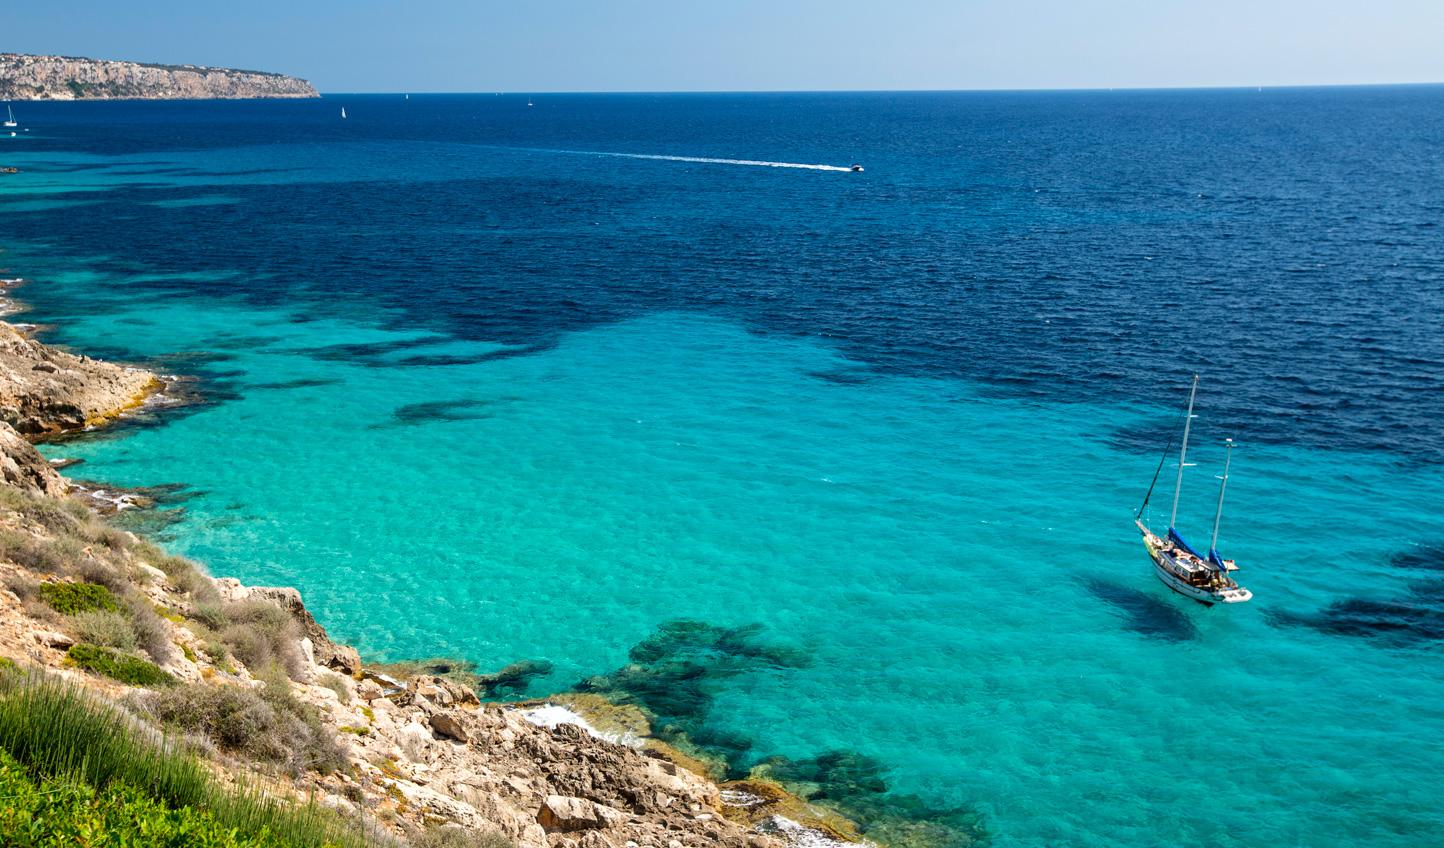 Set sail on the Mediterranean